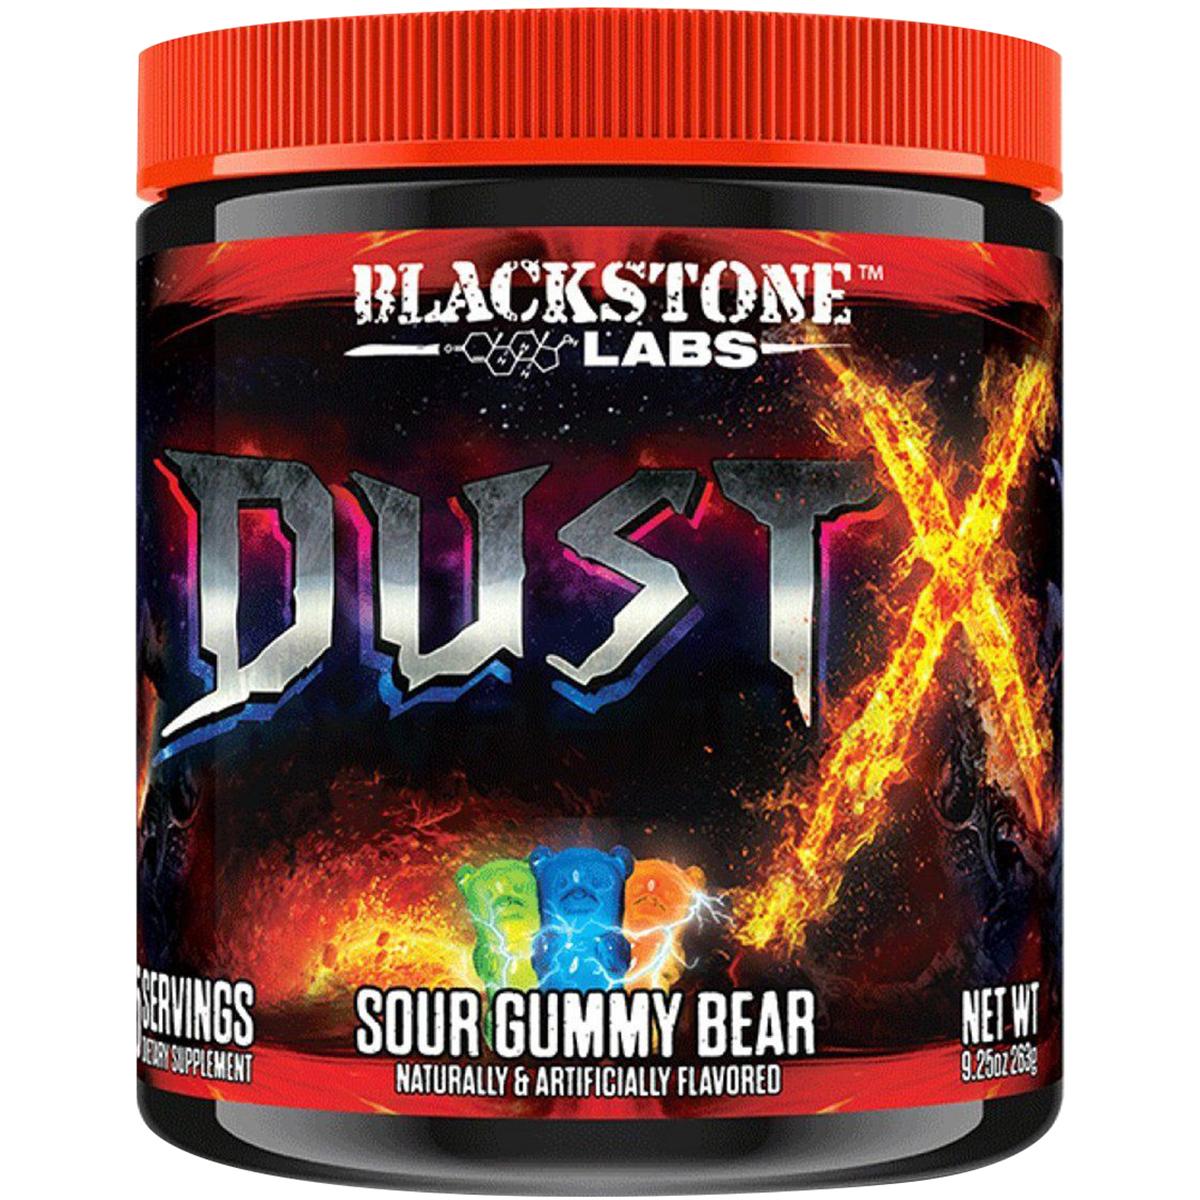 Blackstone Labs Dust X Energy Supplement